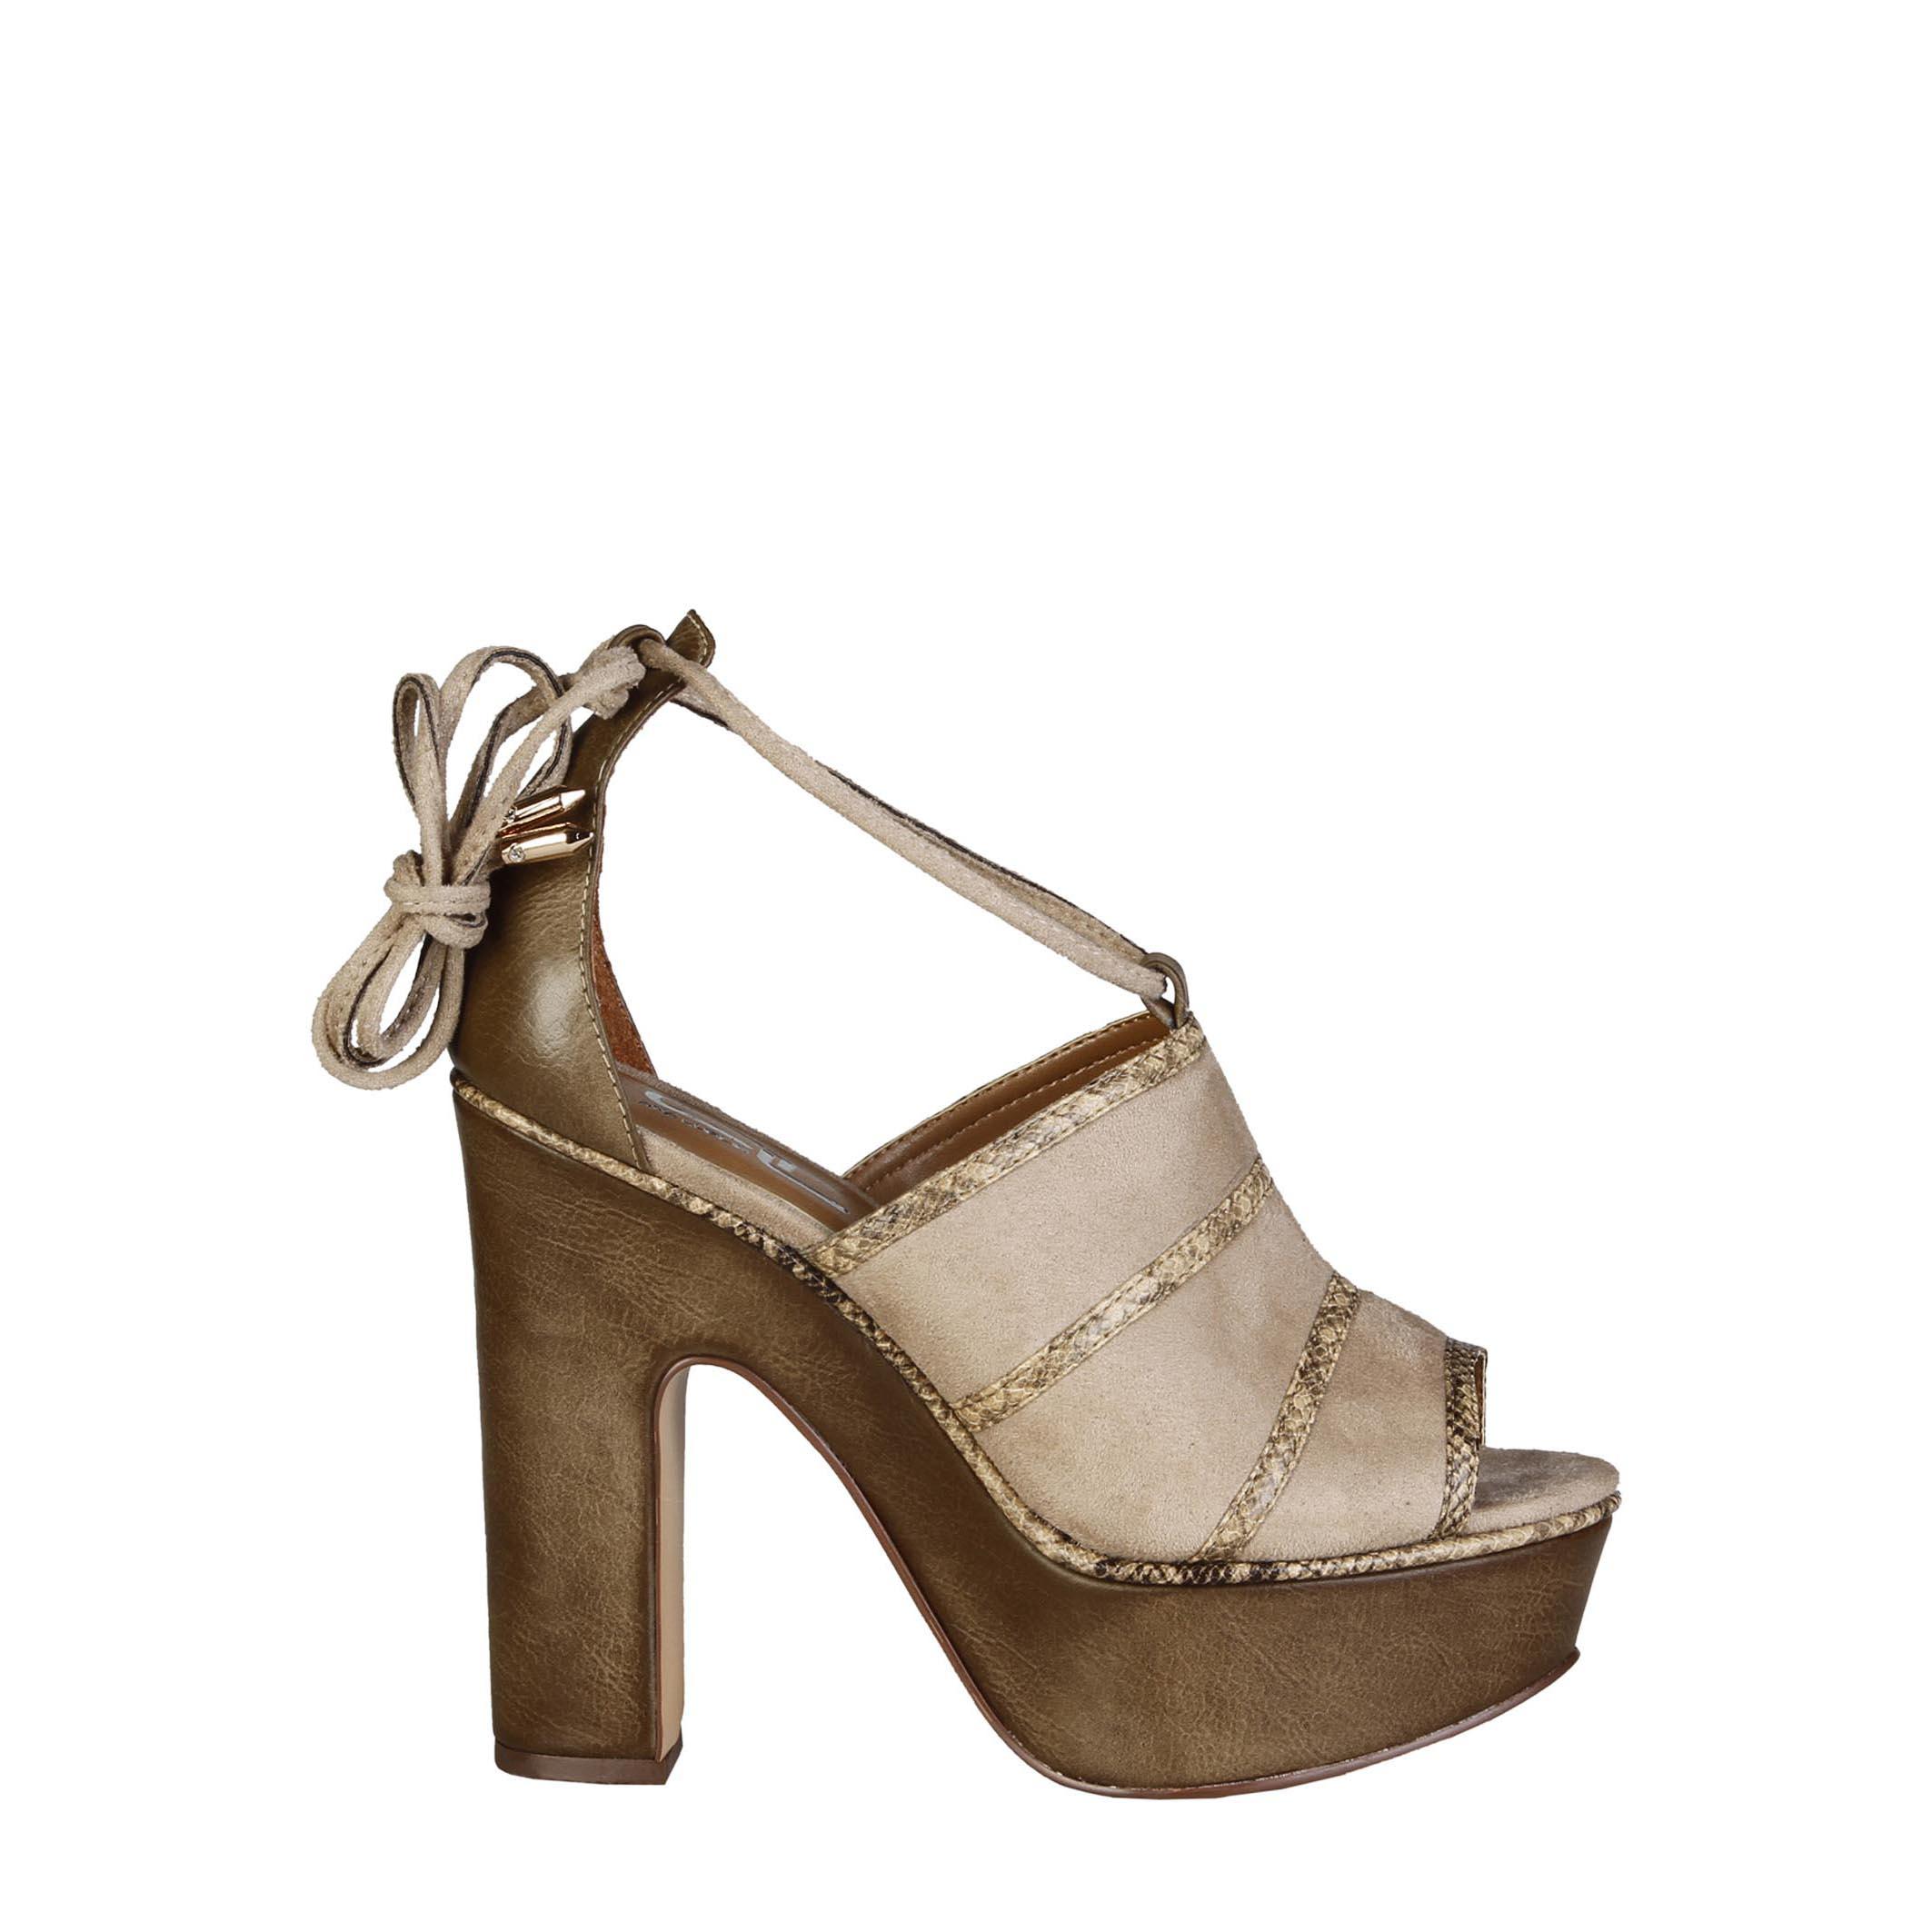 sandale compensee ana lublin otacilia beige